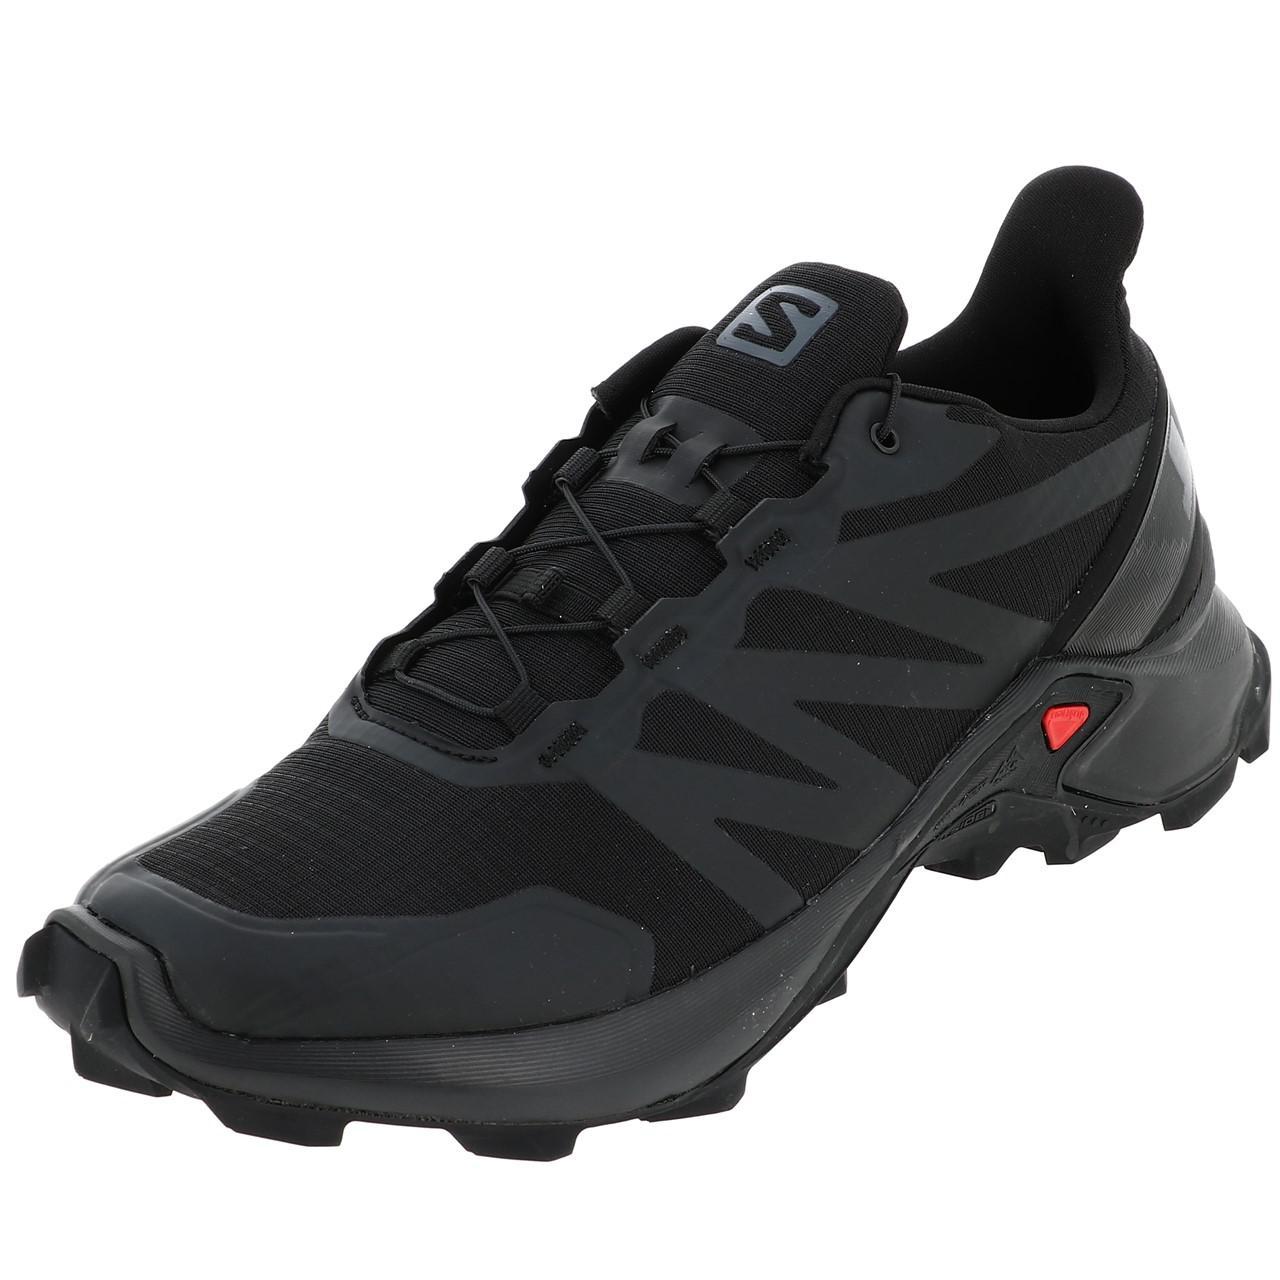 Chaussures Running Trail Femme Salomon Supercross cerise run l